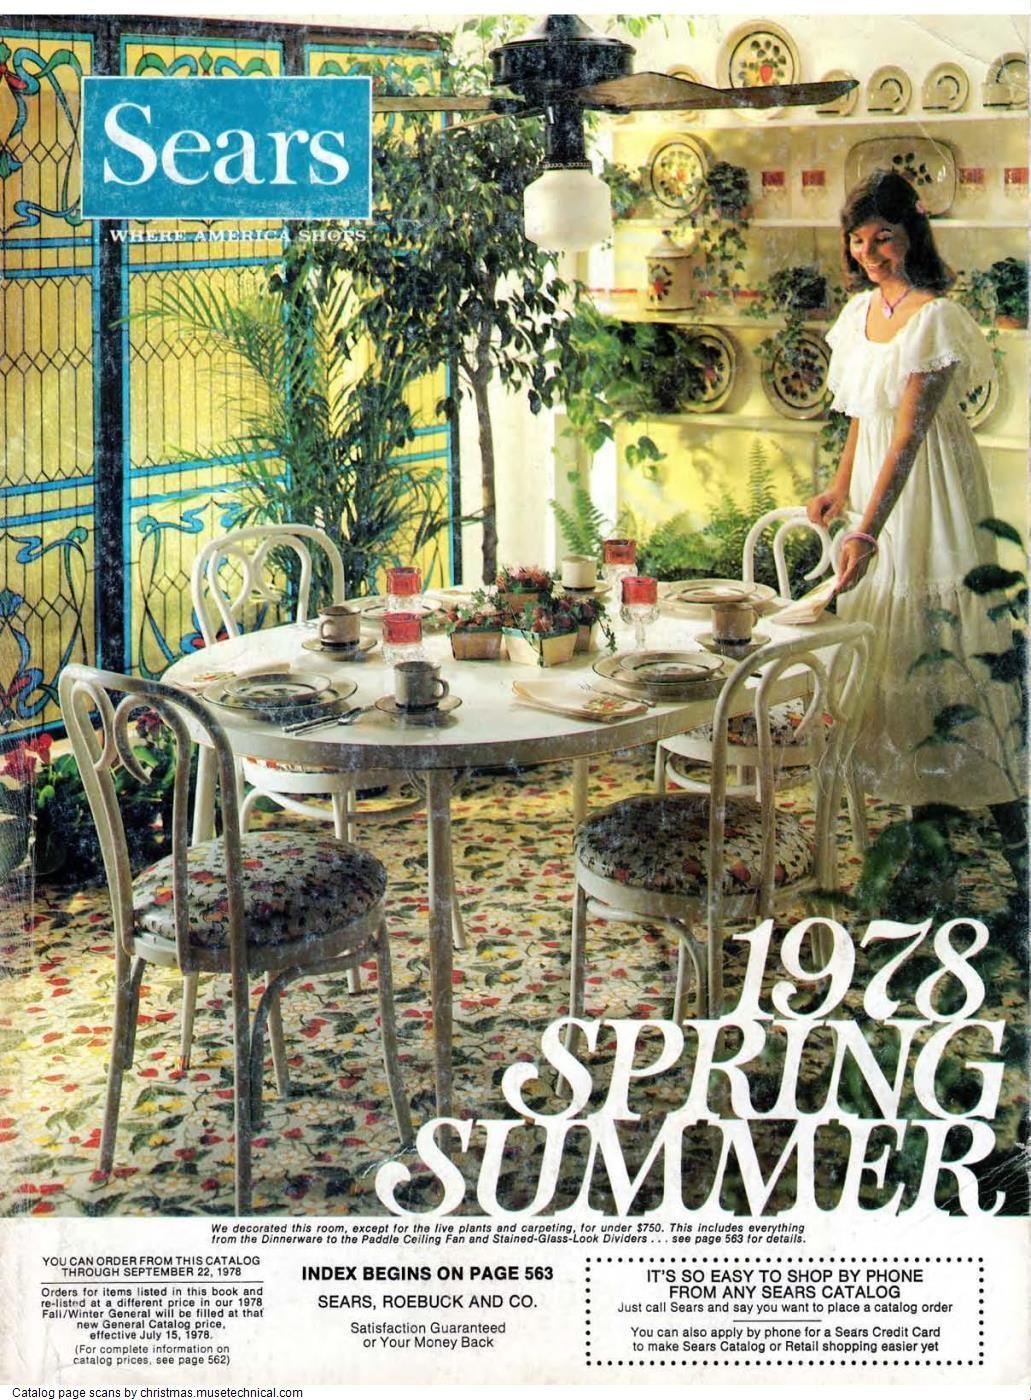 2020 Christmas Catalog Pdf 1978 Sears Spring Summer Catalog PDF in 2020 | Spring summer